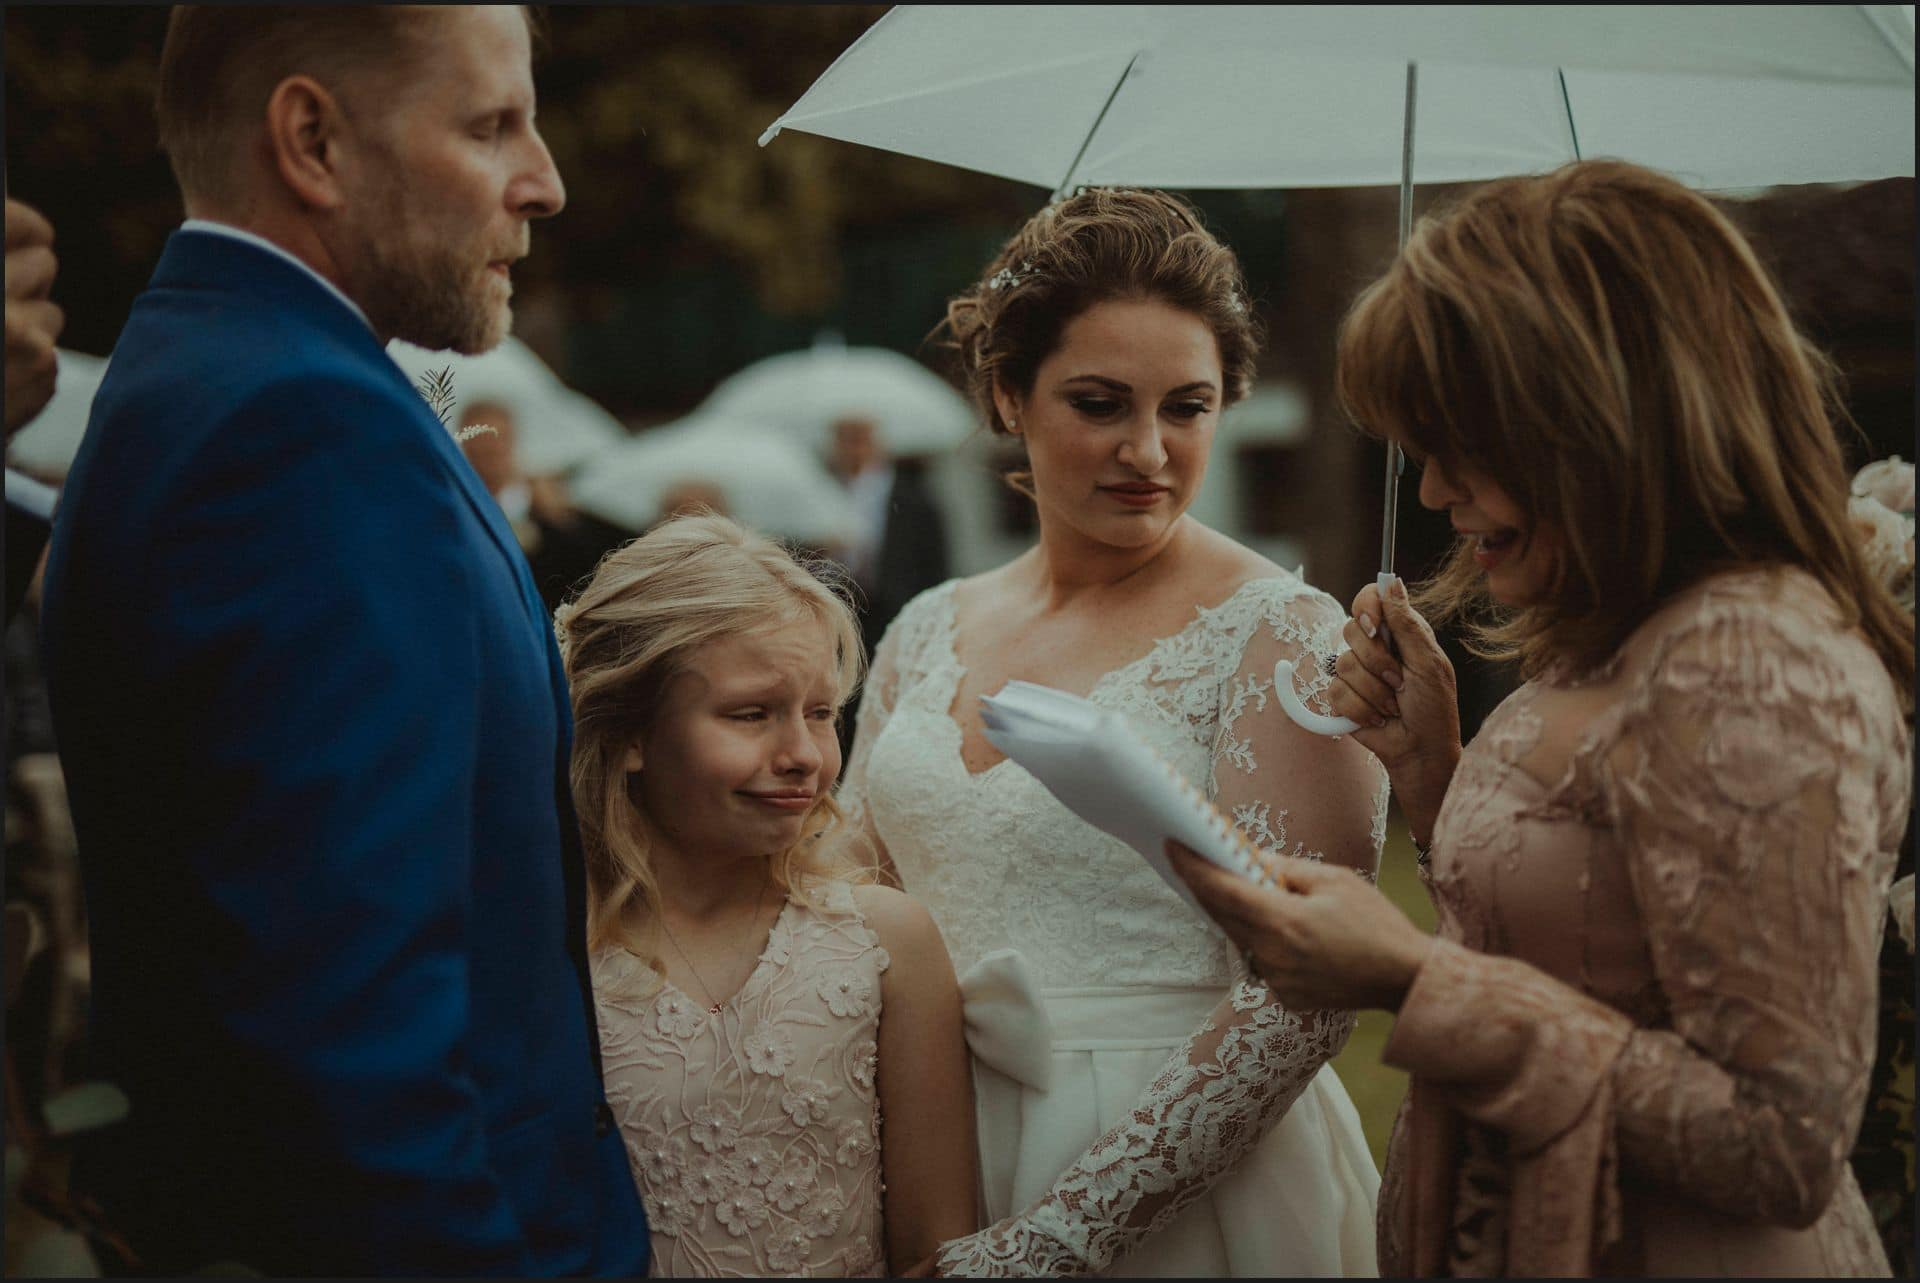 tuscany, destination wedding, chianti, wedding ceremony, bride, groom, daughter, cry